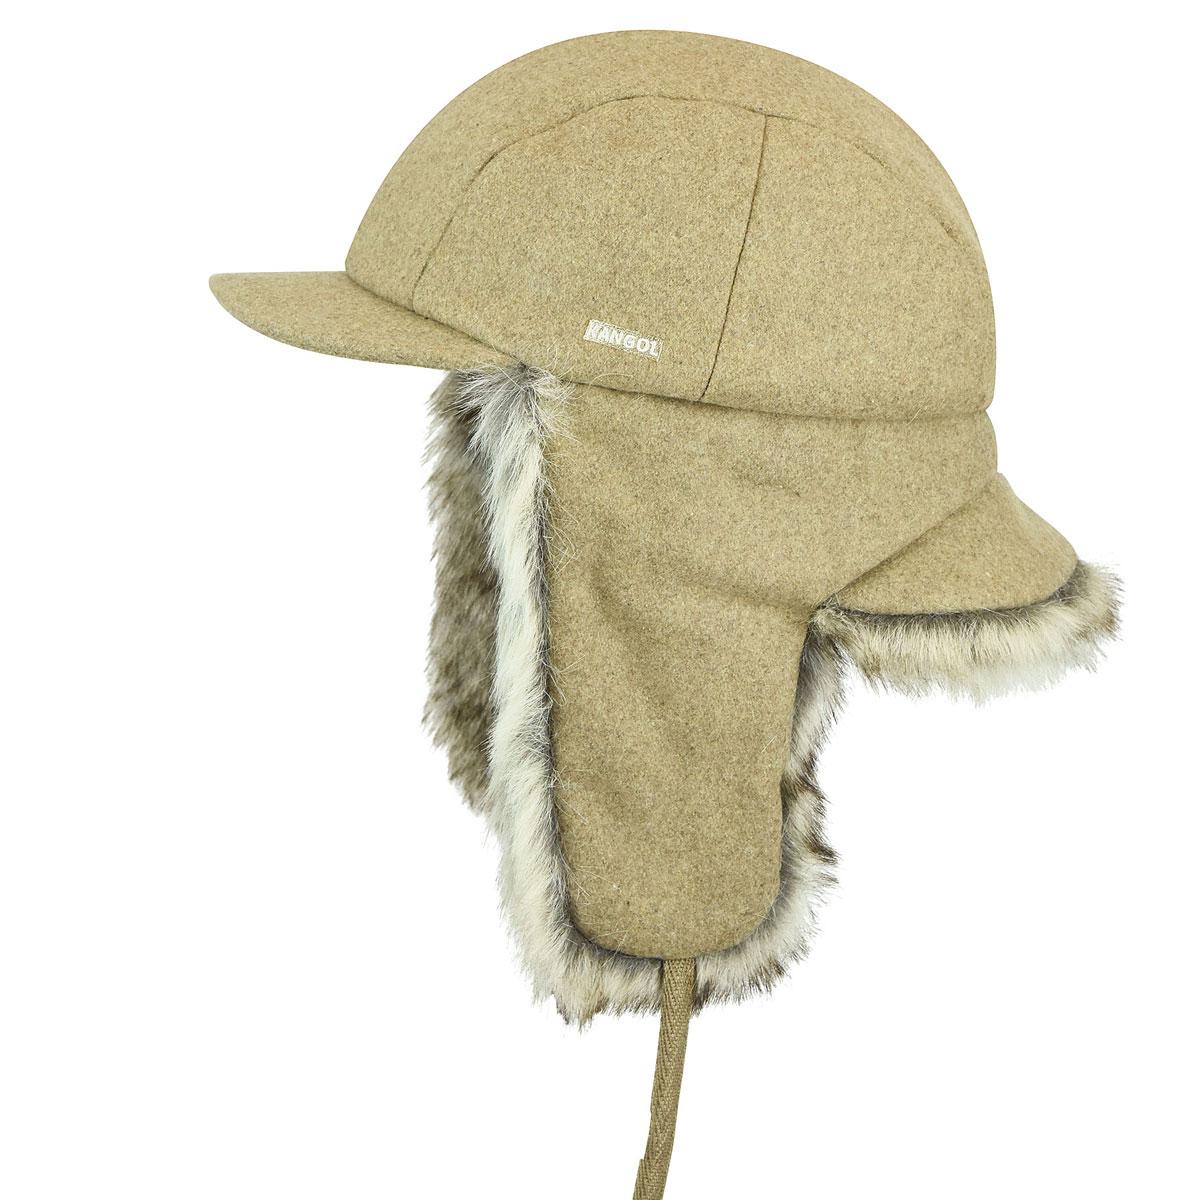 Kangol Wool Aviator in Camel